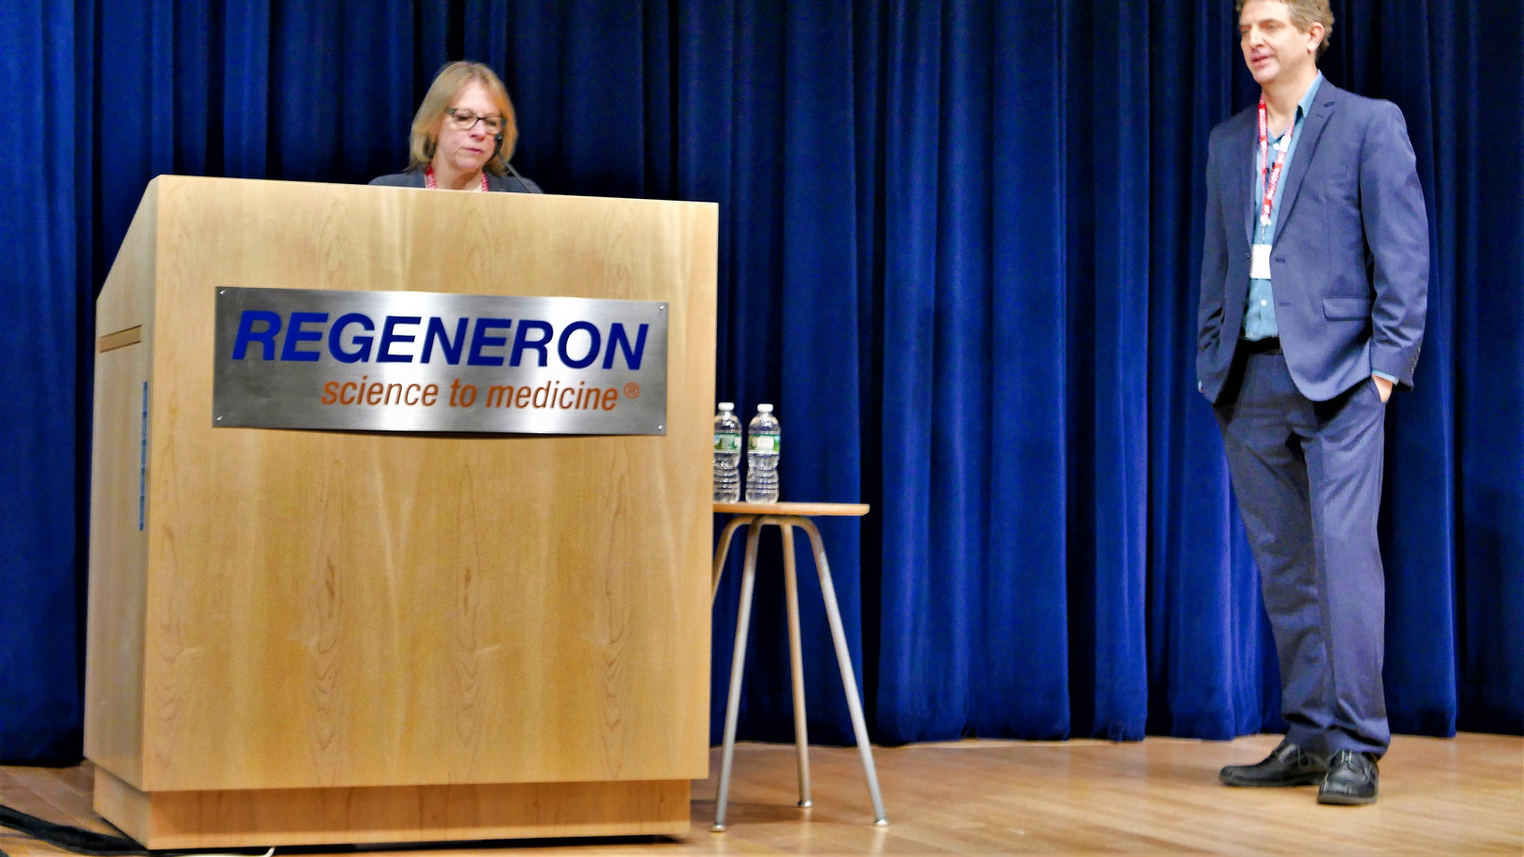 Cynthia Bristow introduces Richard DeMarco – EMD Millipore